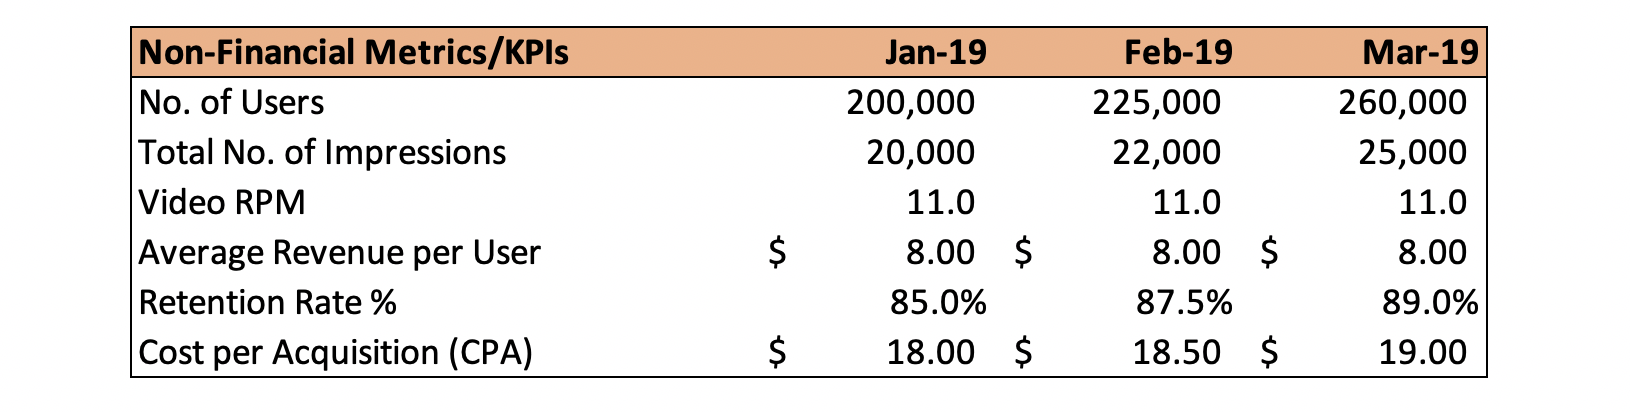 Non-financial metrics and KPIs.